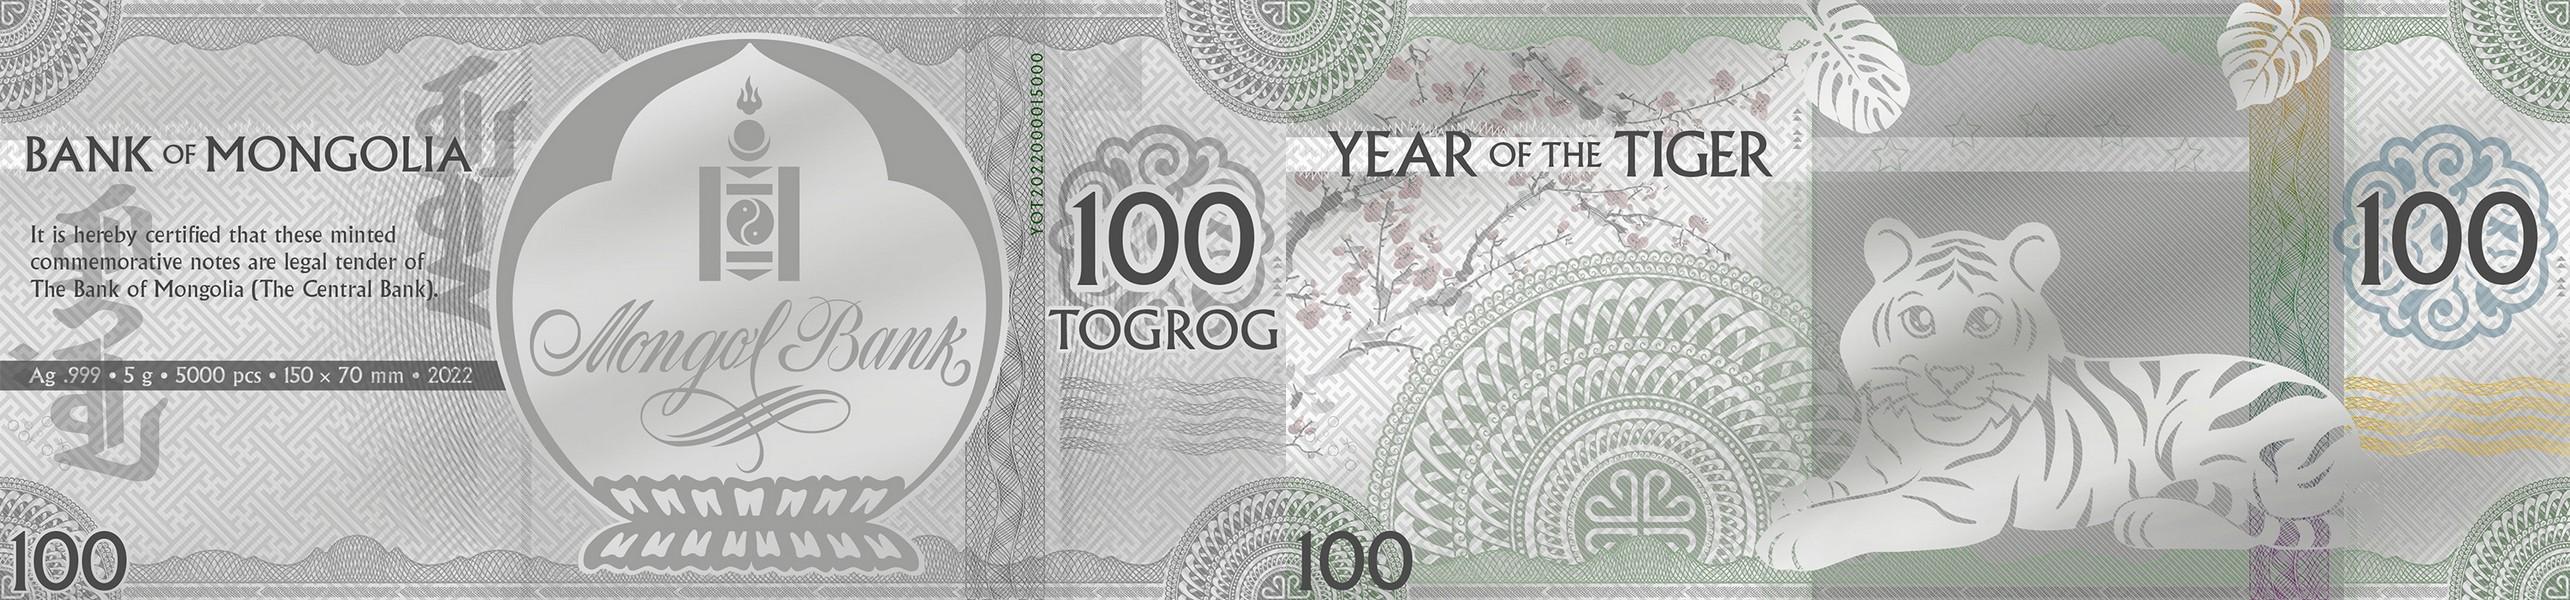 mongolie-2022-billet-annee-du-tigre